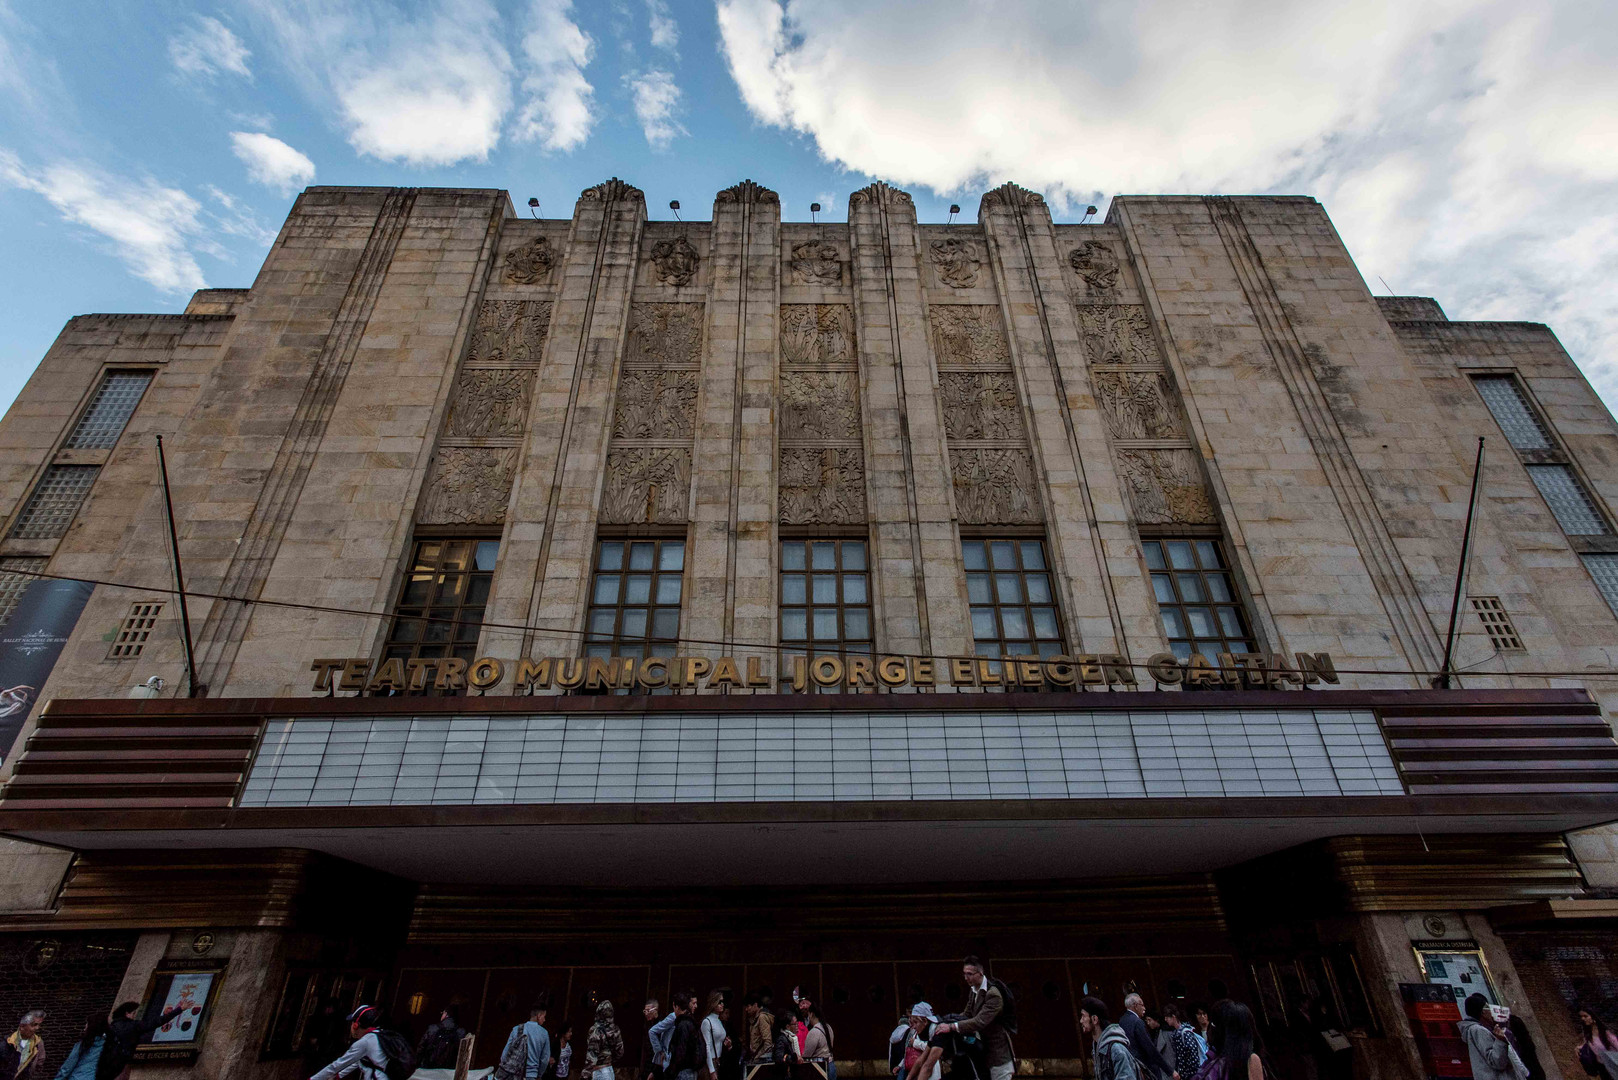 Teatro Municipal Jorge Eliécer Gaitán